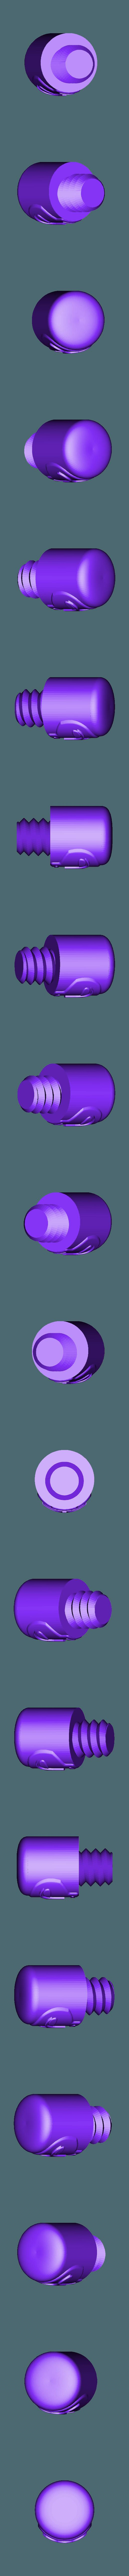 Tete_plasmide.stl Download free STL file Plasmid vial remix (separate parts + screwable head) • 3D print model, conceptify